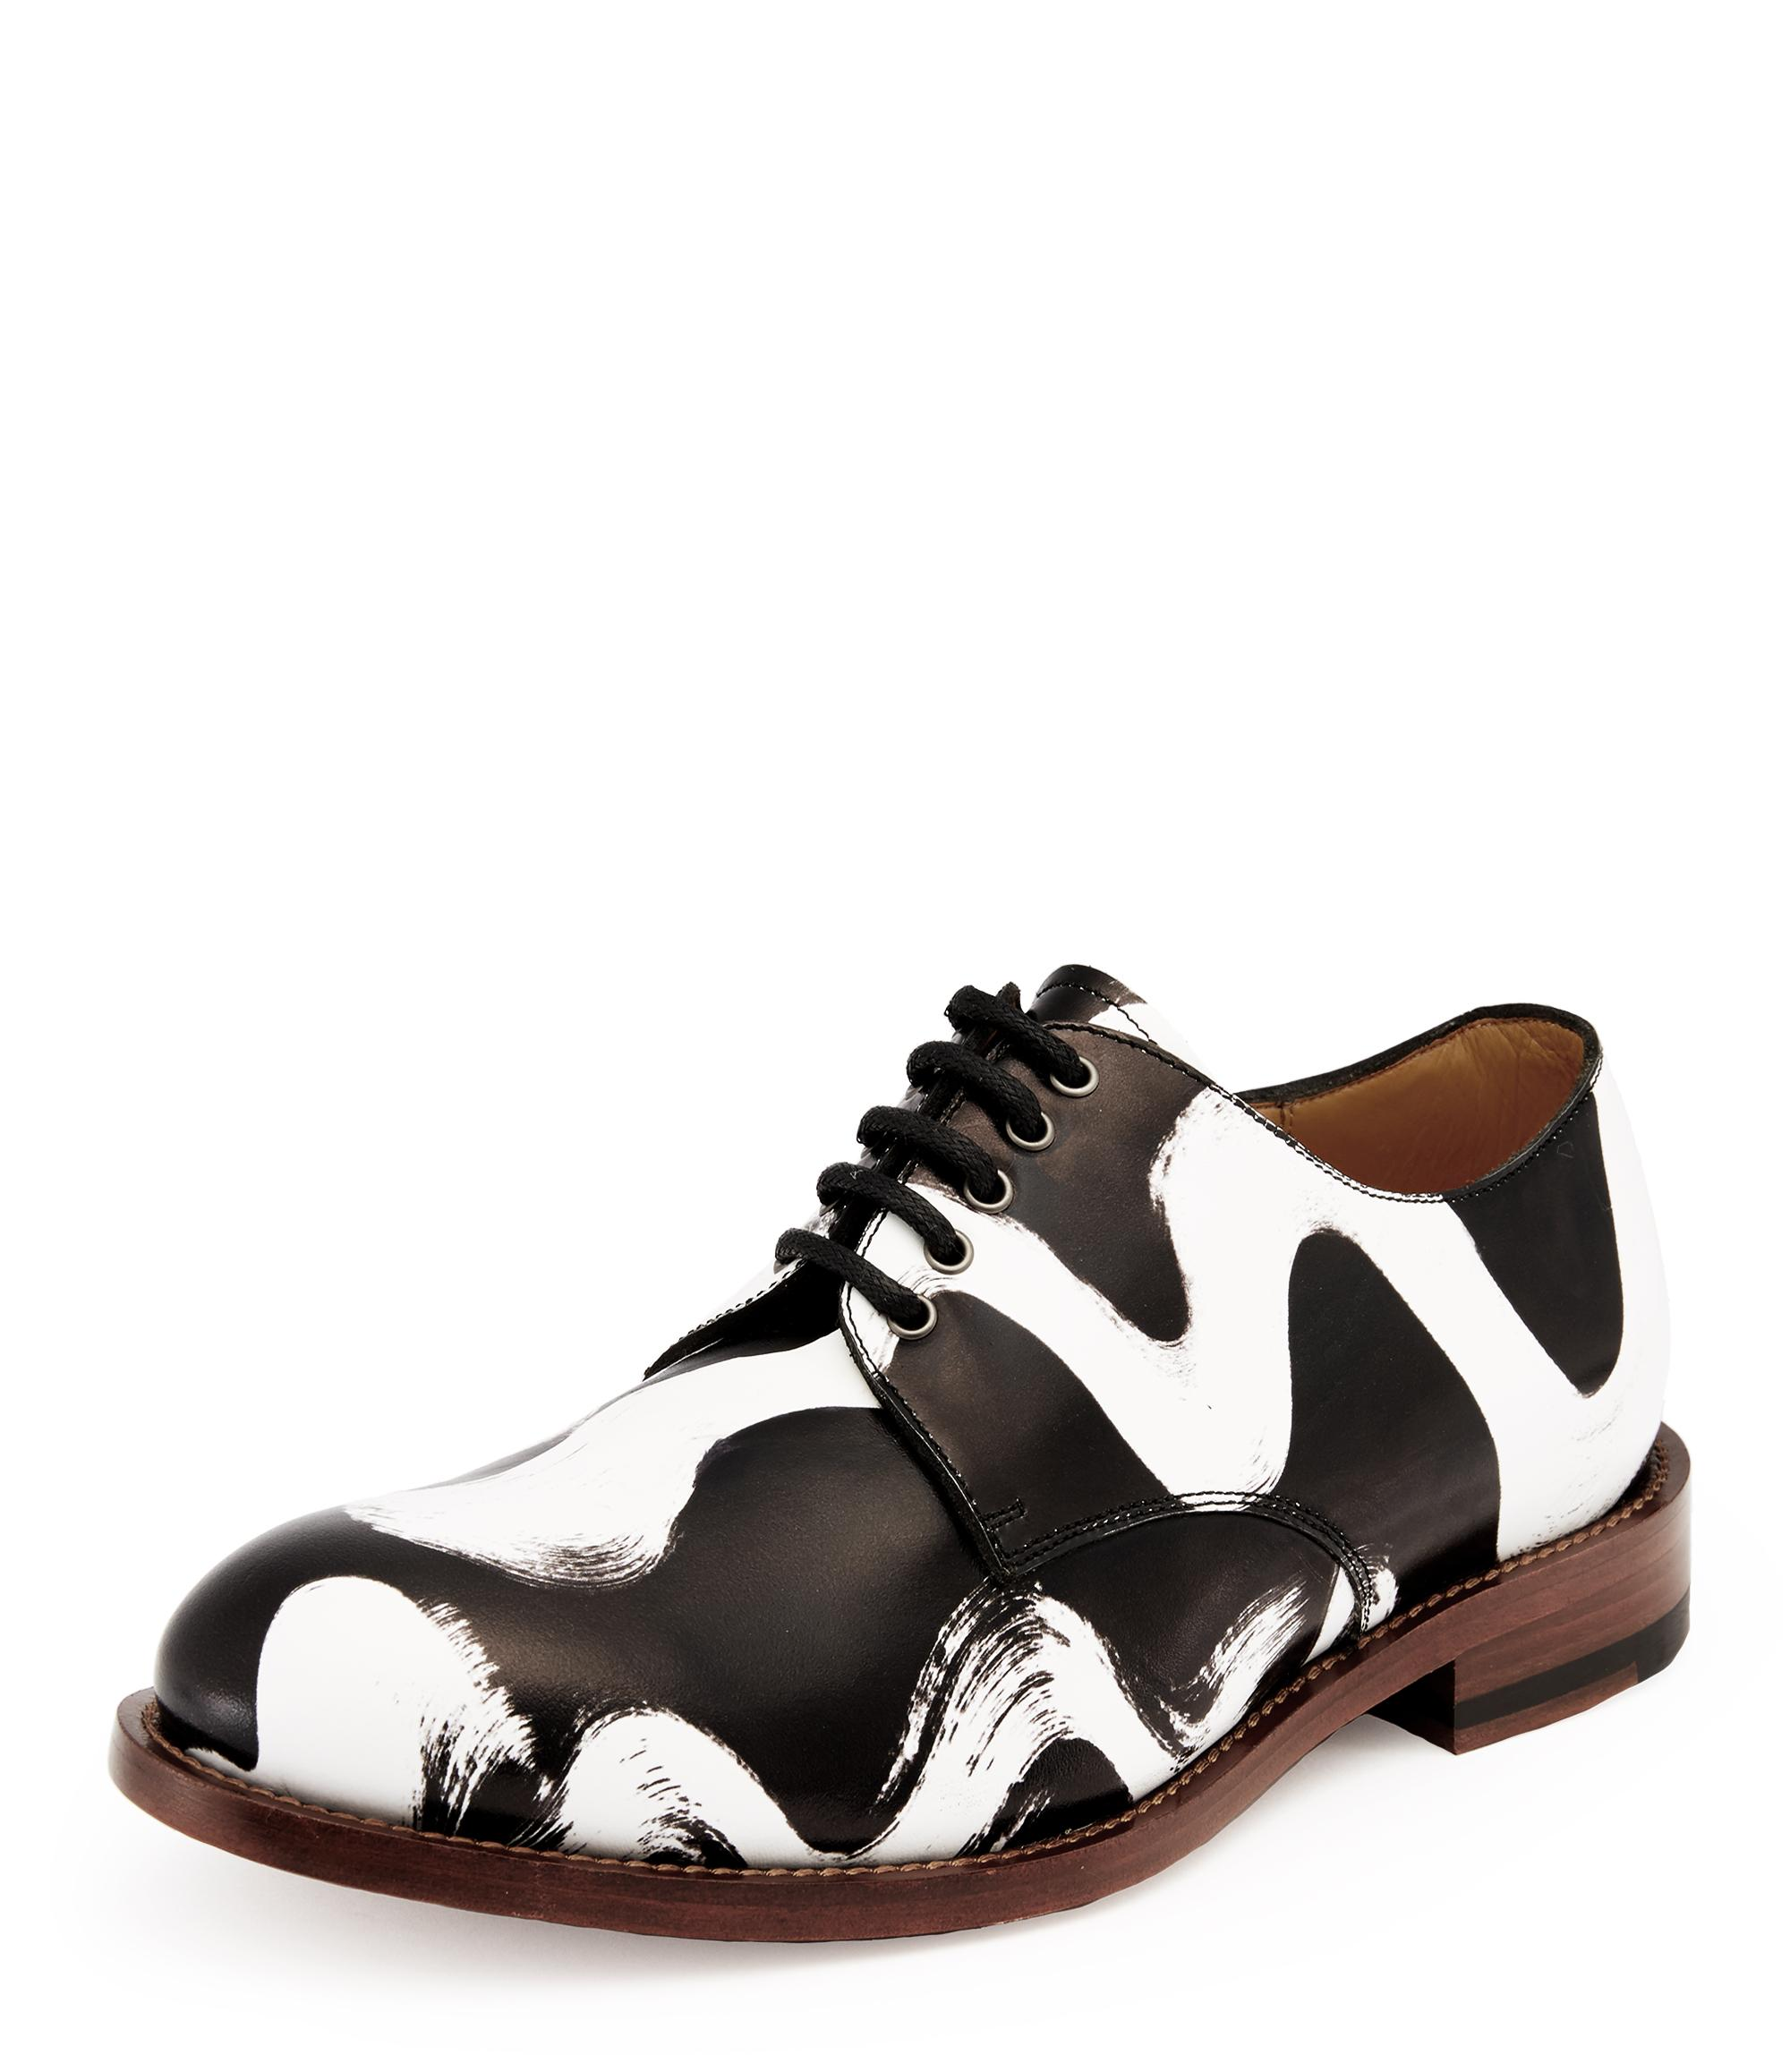 1bda0730eb2 Utility Derby Lace Up Shoes Vivienne's Squiggle Black/White